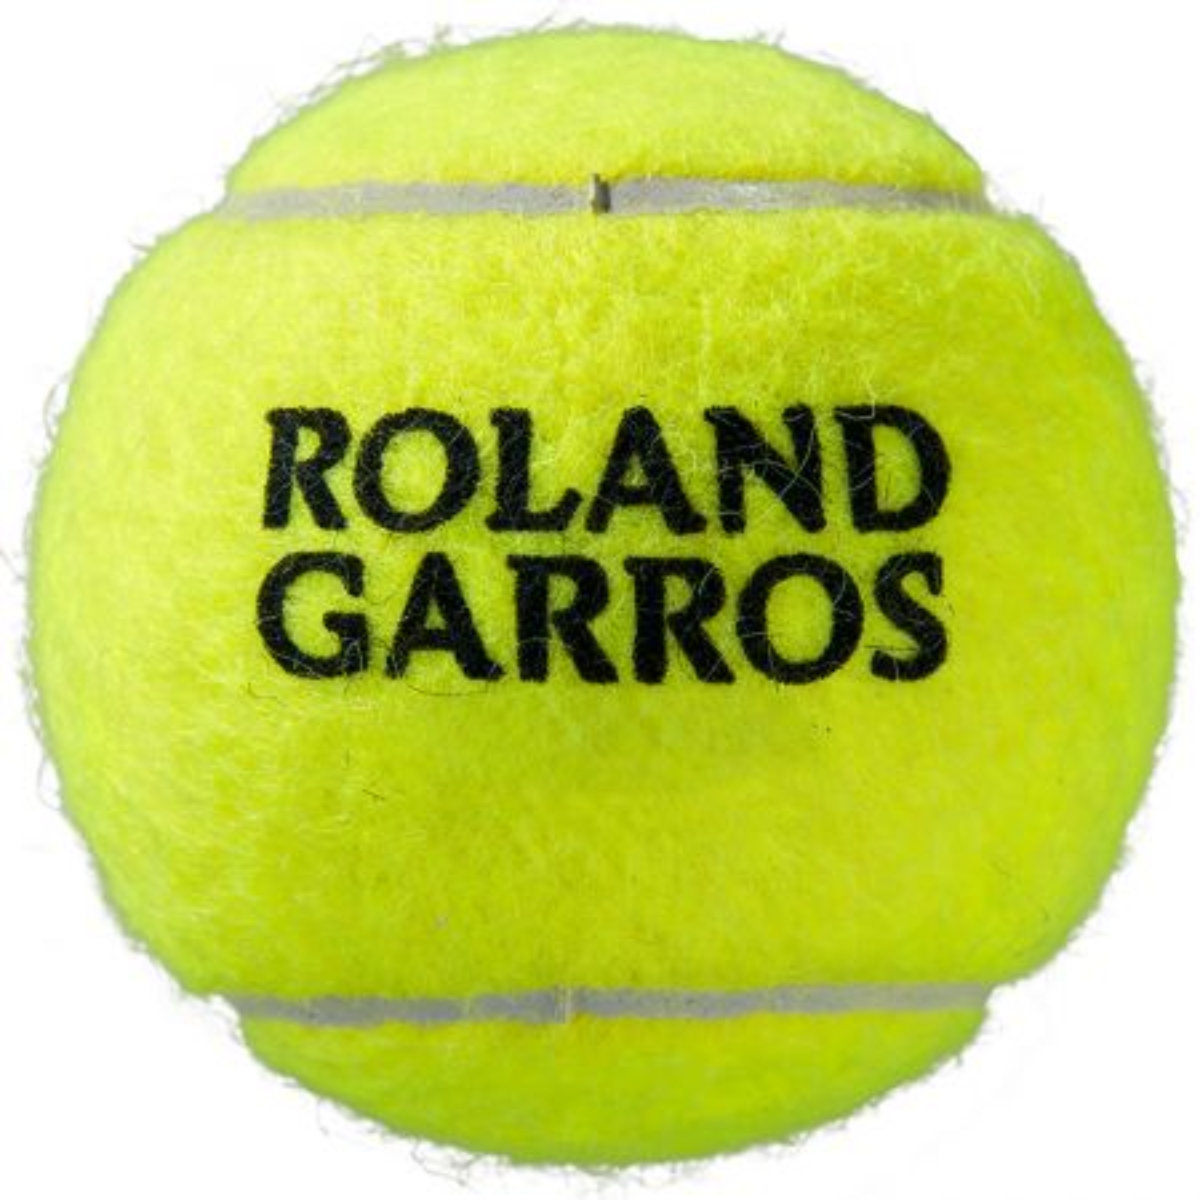 Wilson Roland Garros Clay 4 loptice za tenis